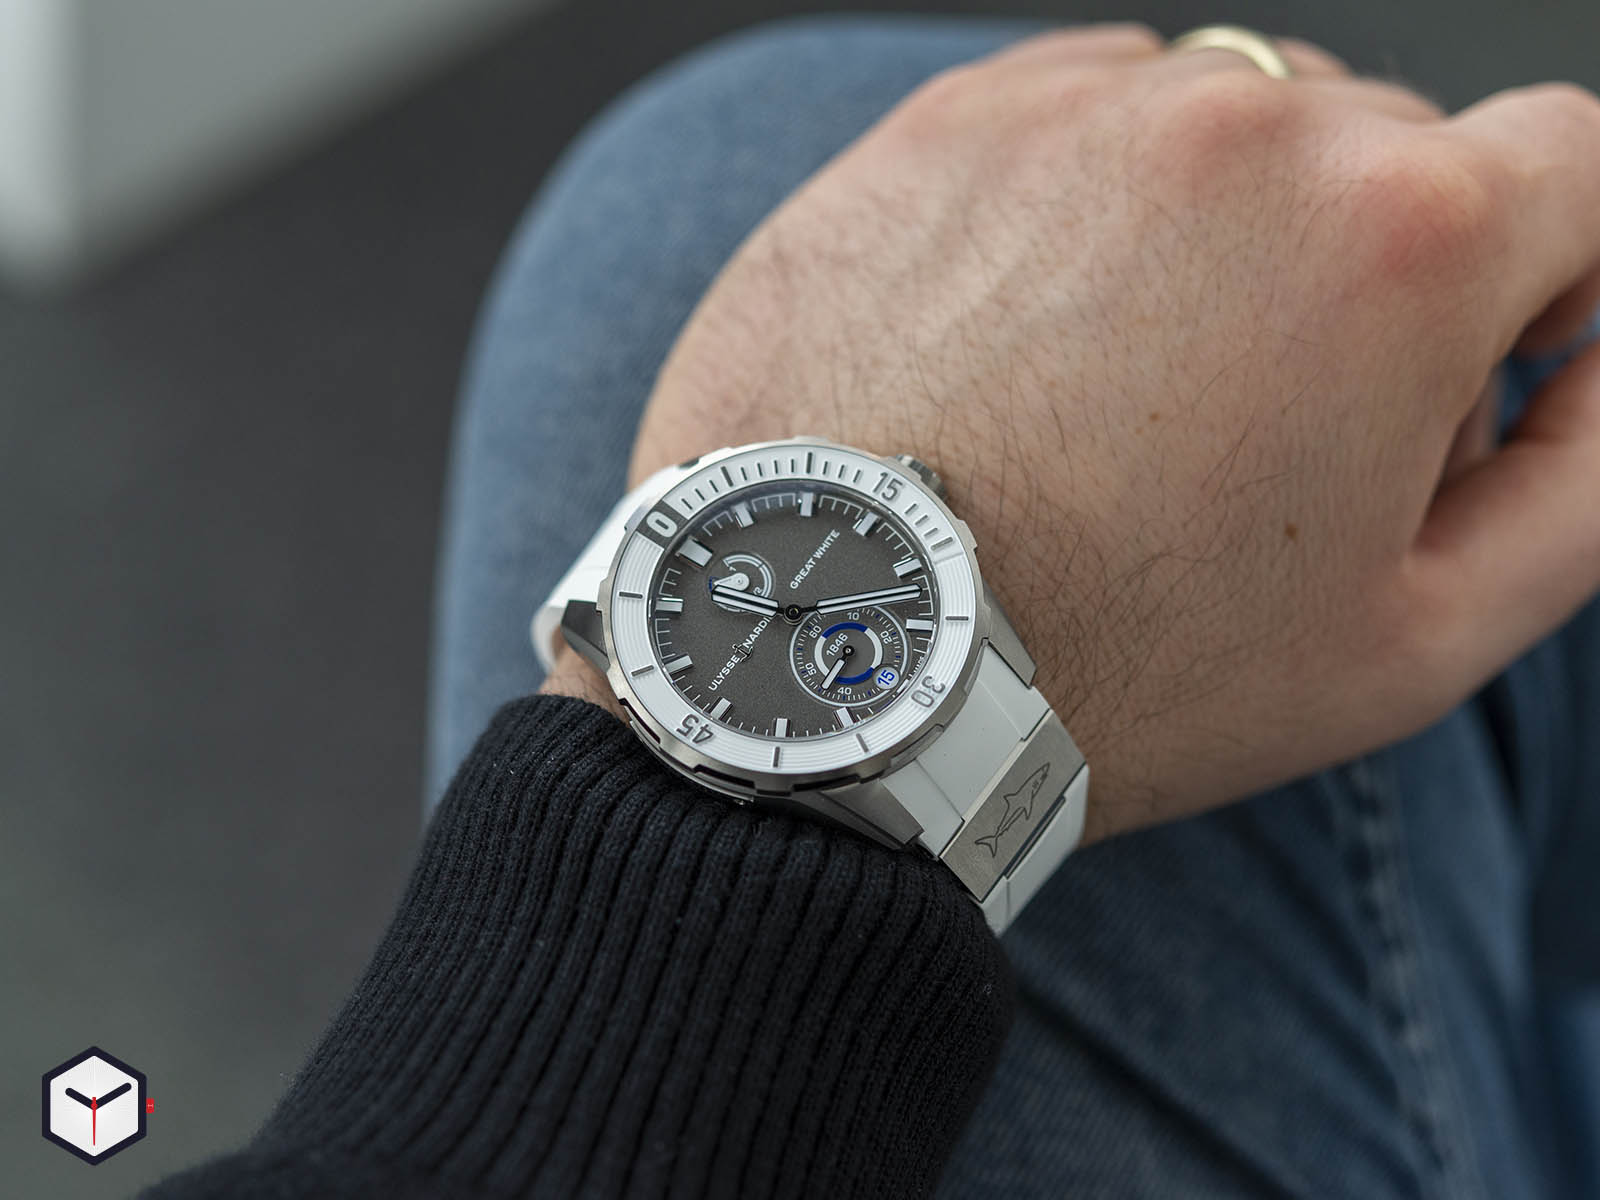 1183-170le-3-90-gw-ulysse-nardin-diver-chronometer-7.jpg